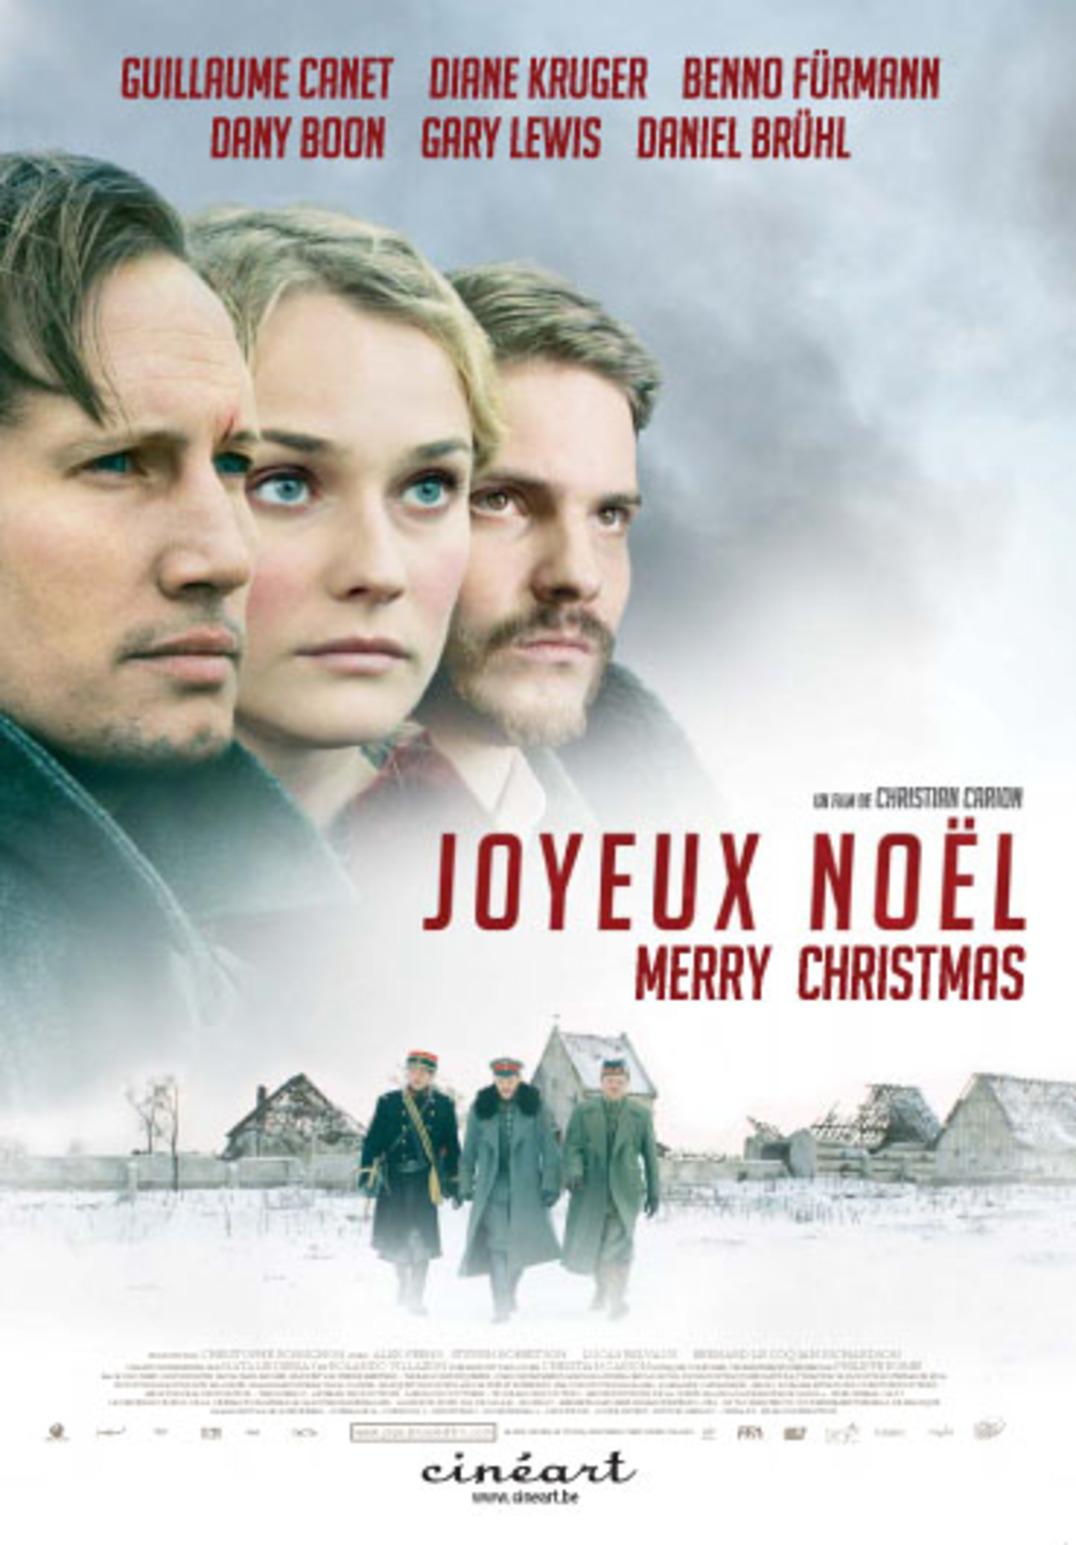 Joyeux Noel (2005) - Photo Gallery - IMDb